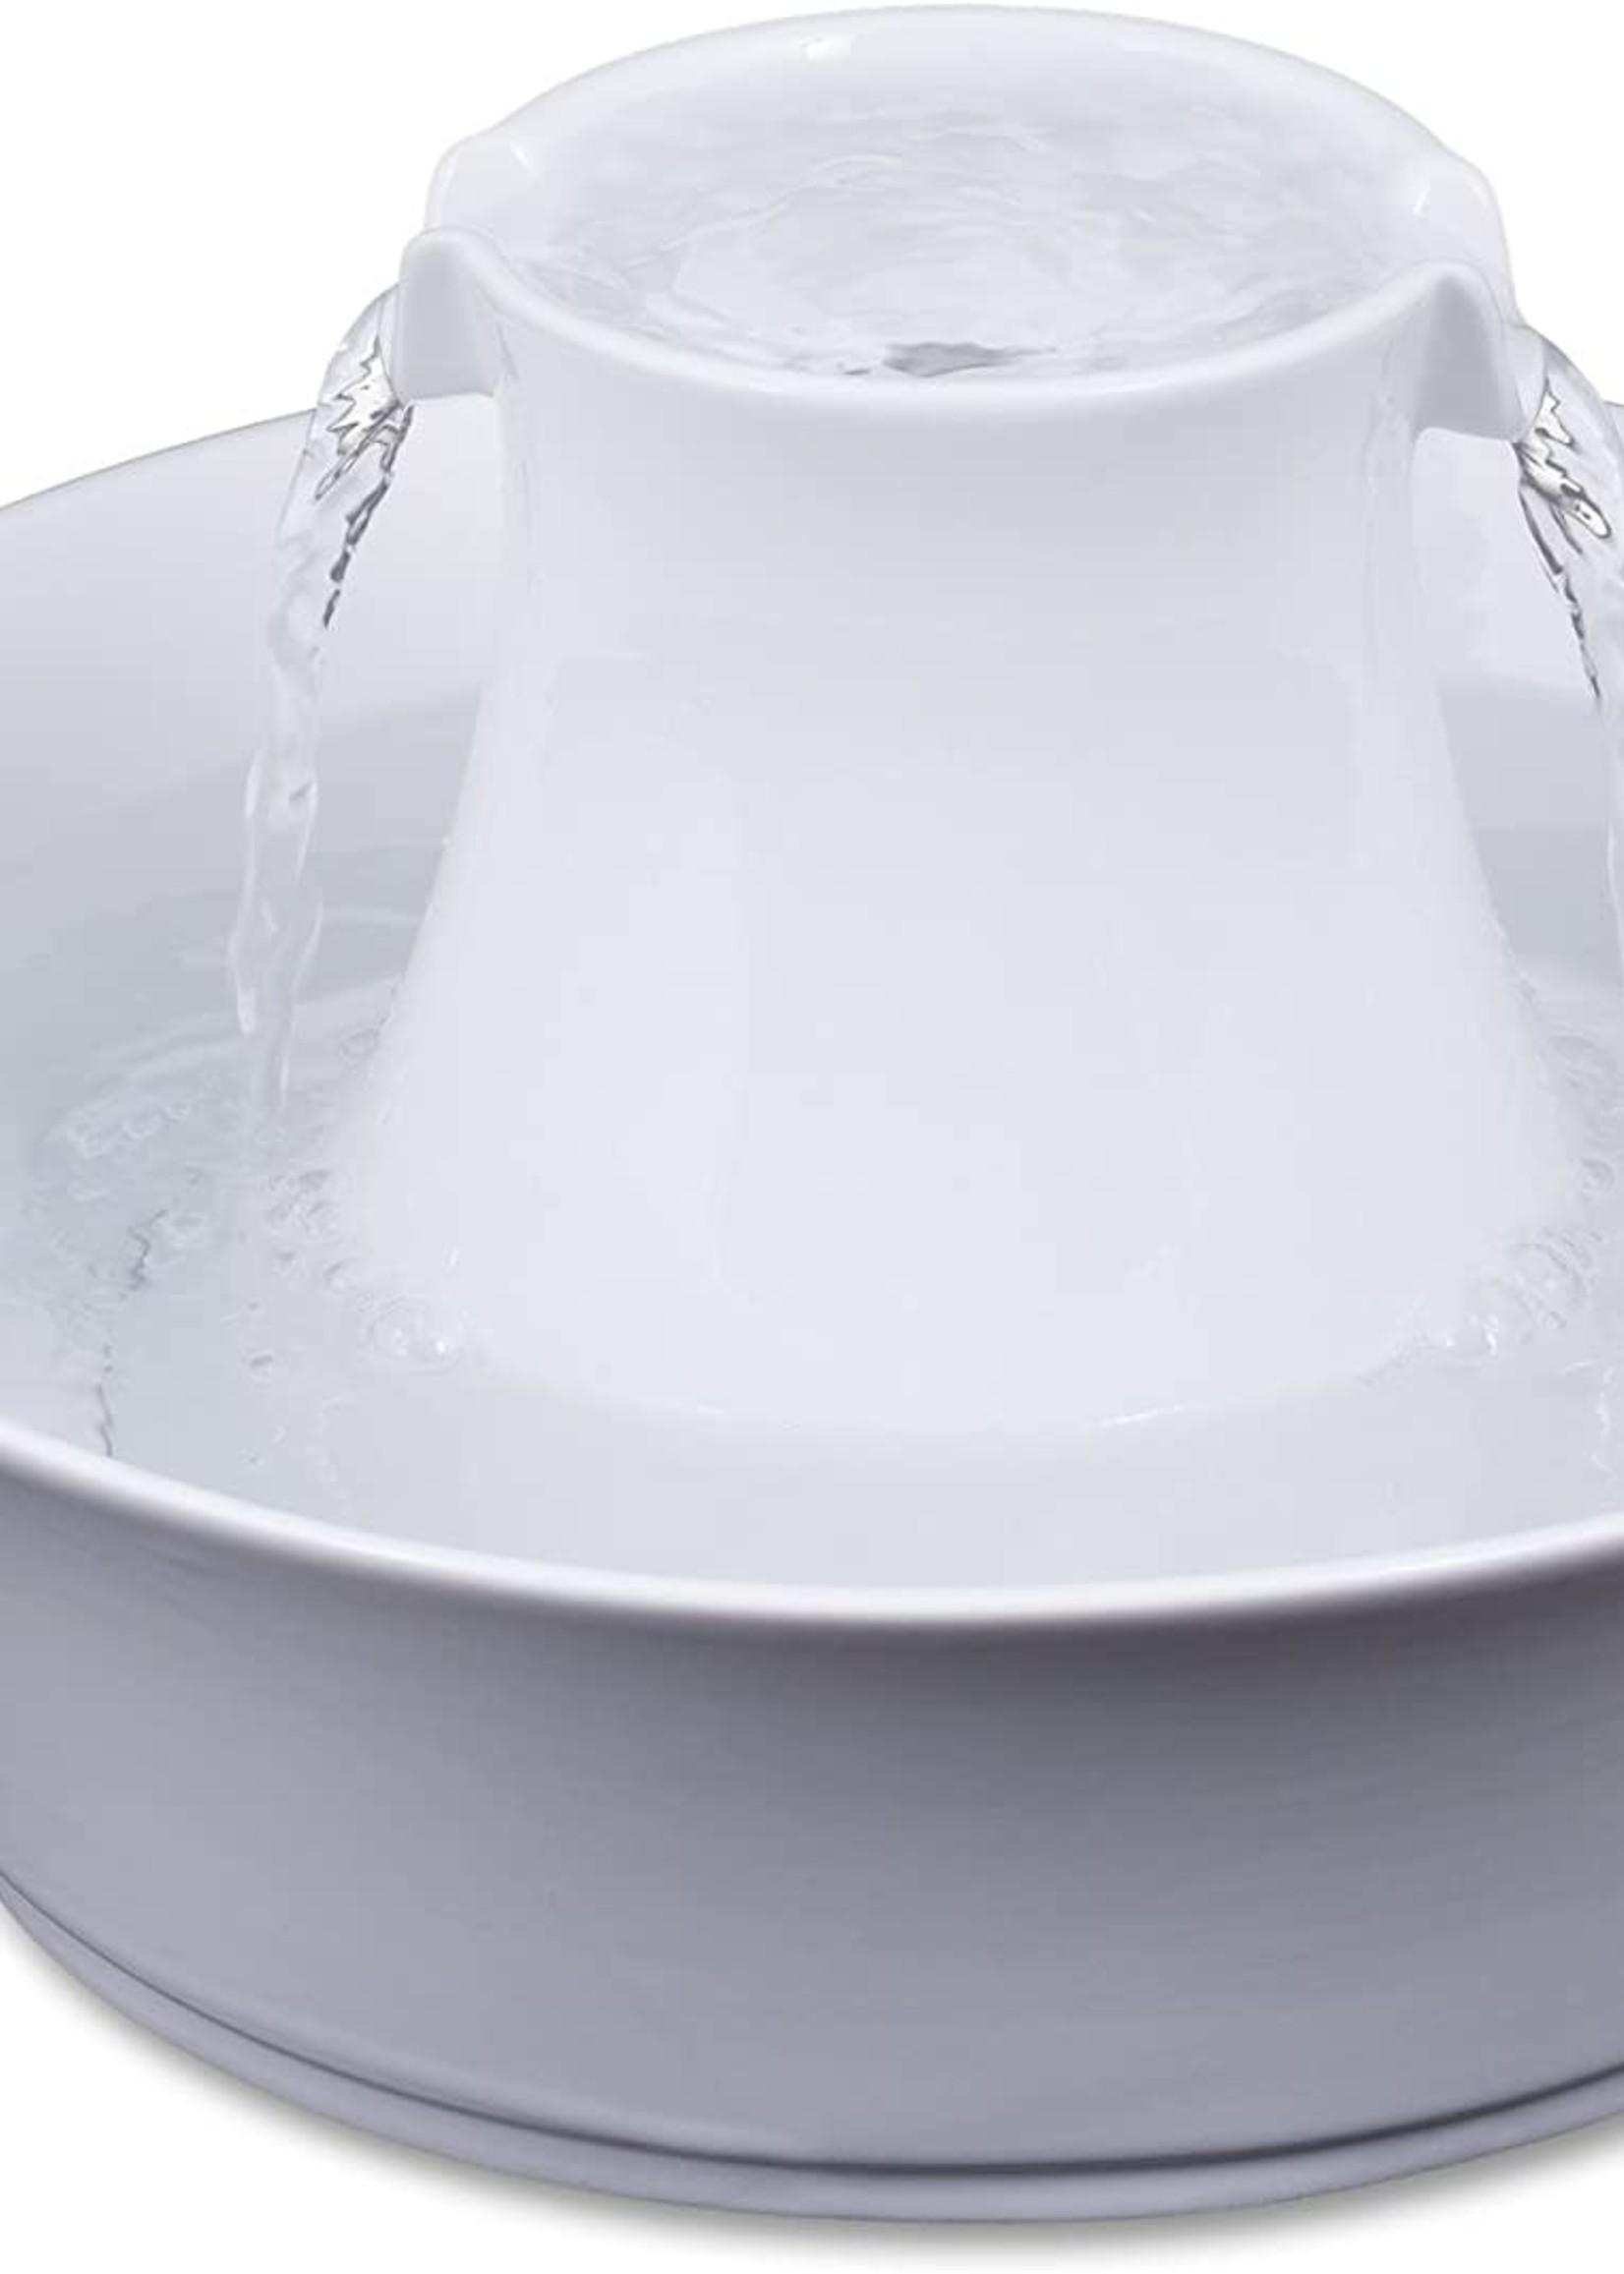 PetSafe® DRINKWELL CERAMIC AVALON PET FOUNTAIN WHITE